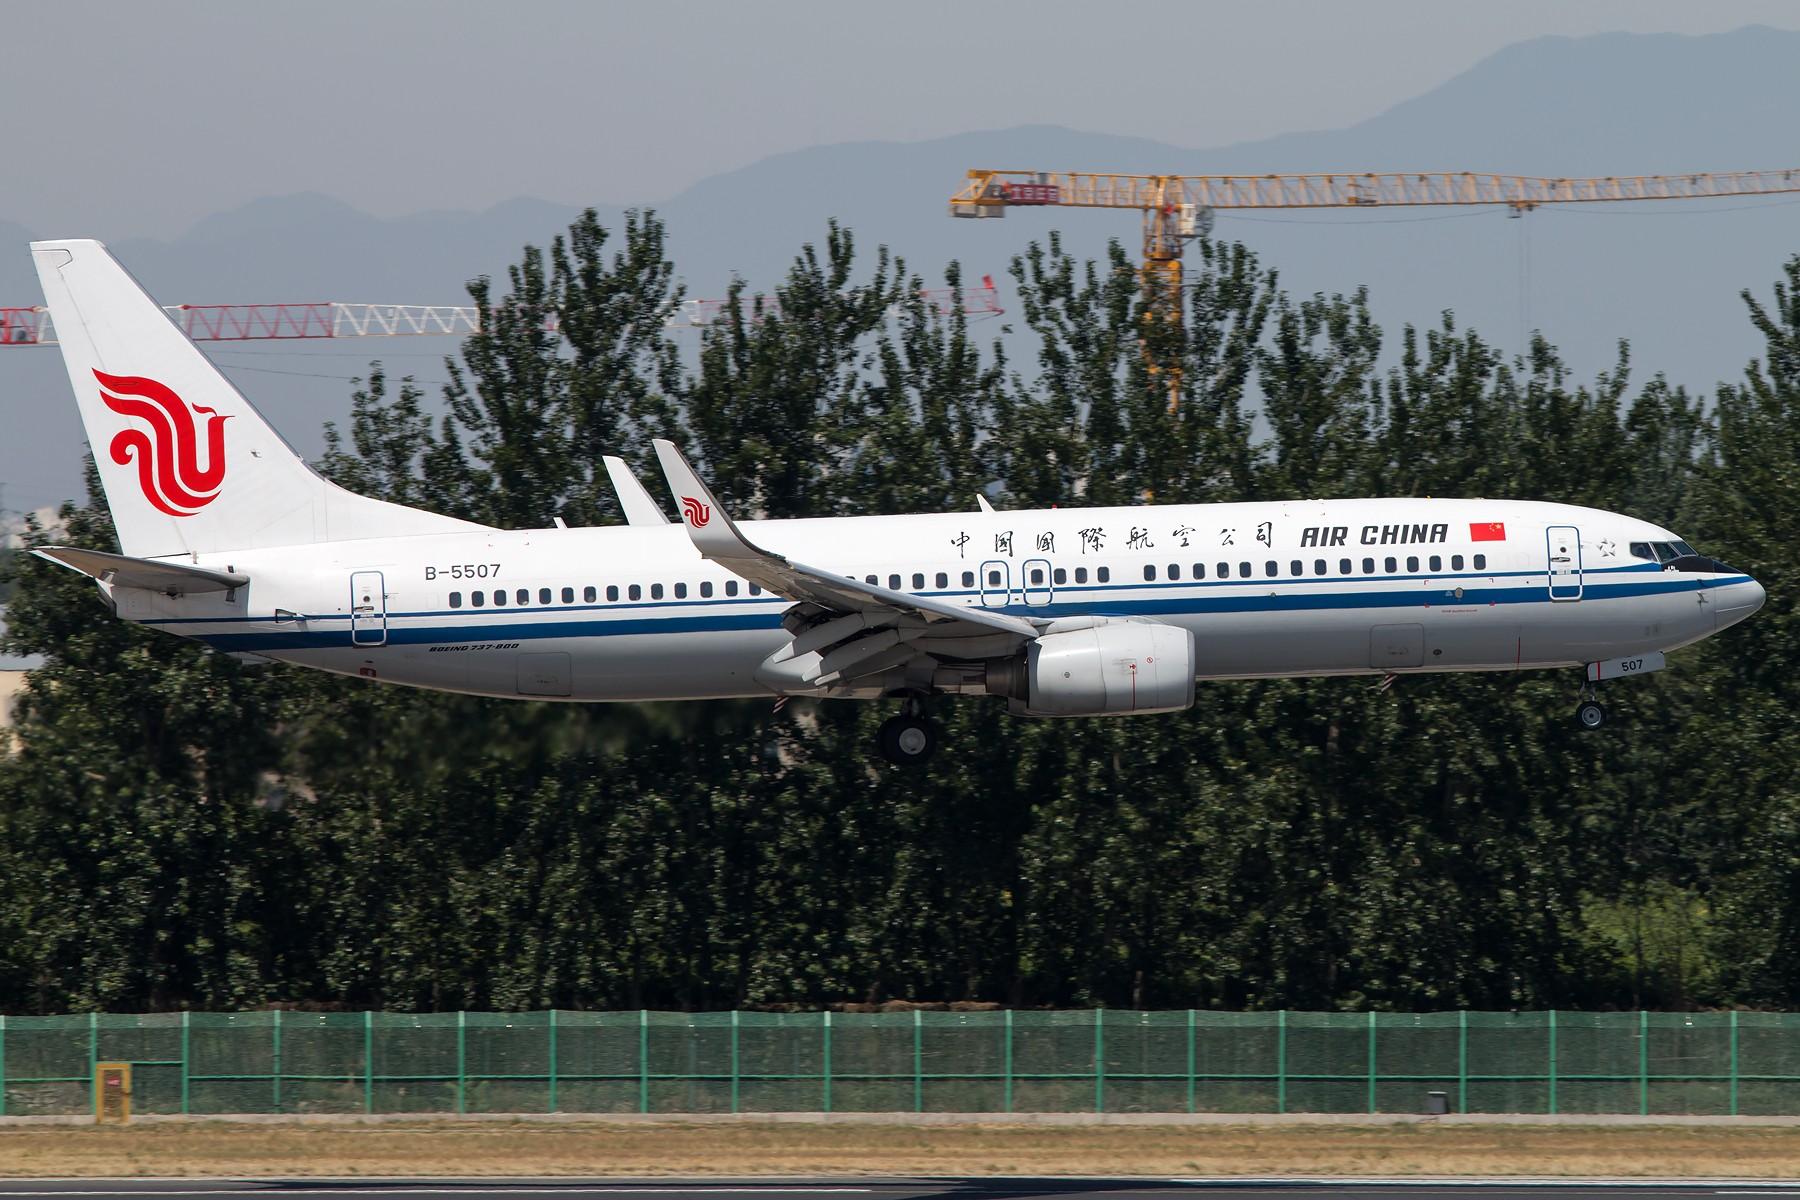 Re:[原创]三大航普通装 1800*1200 [10pics] BOEING 737-800 B-5507 中国北京首都国际机场